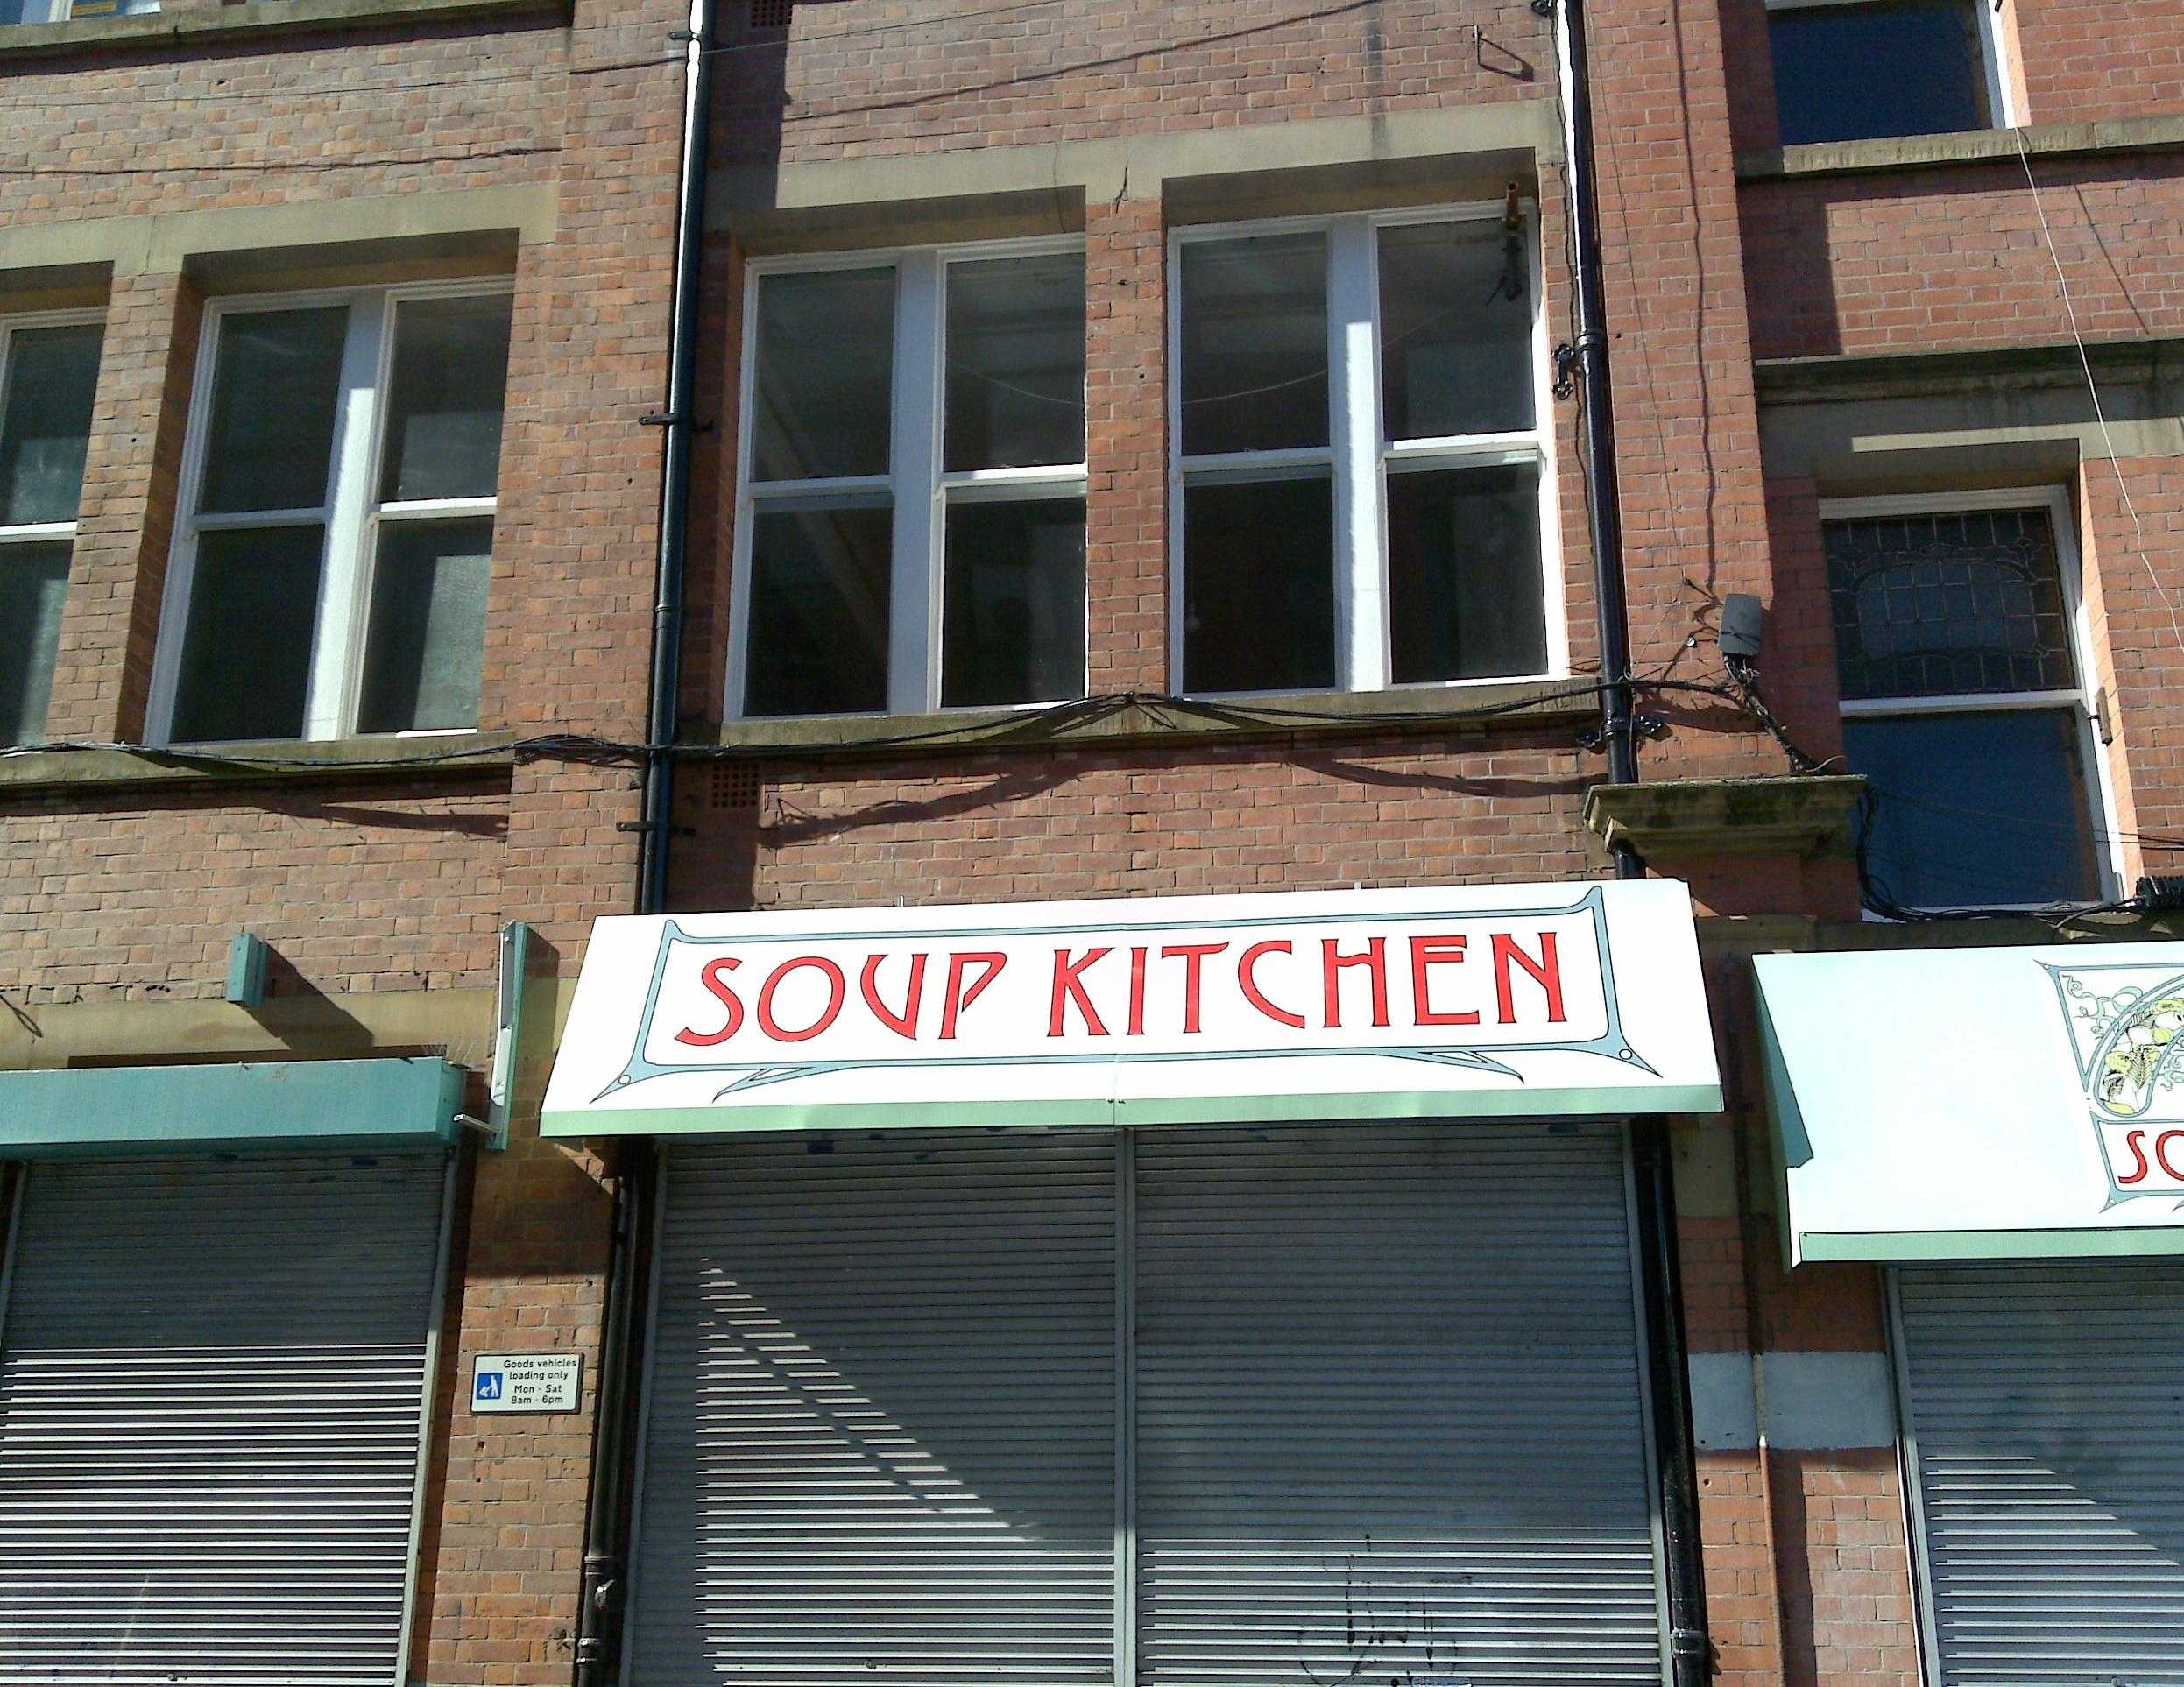 Volunteer Soup Kitchen Nyc Christmas